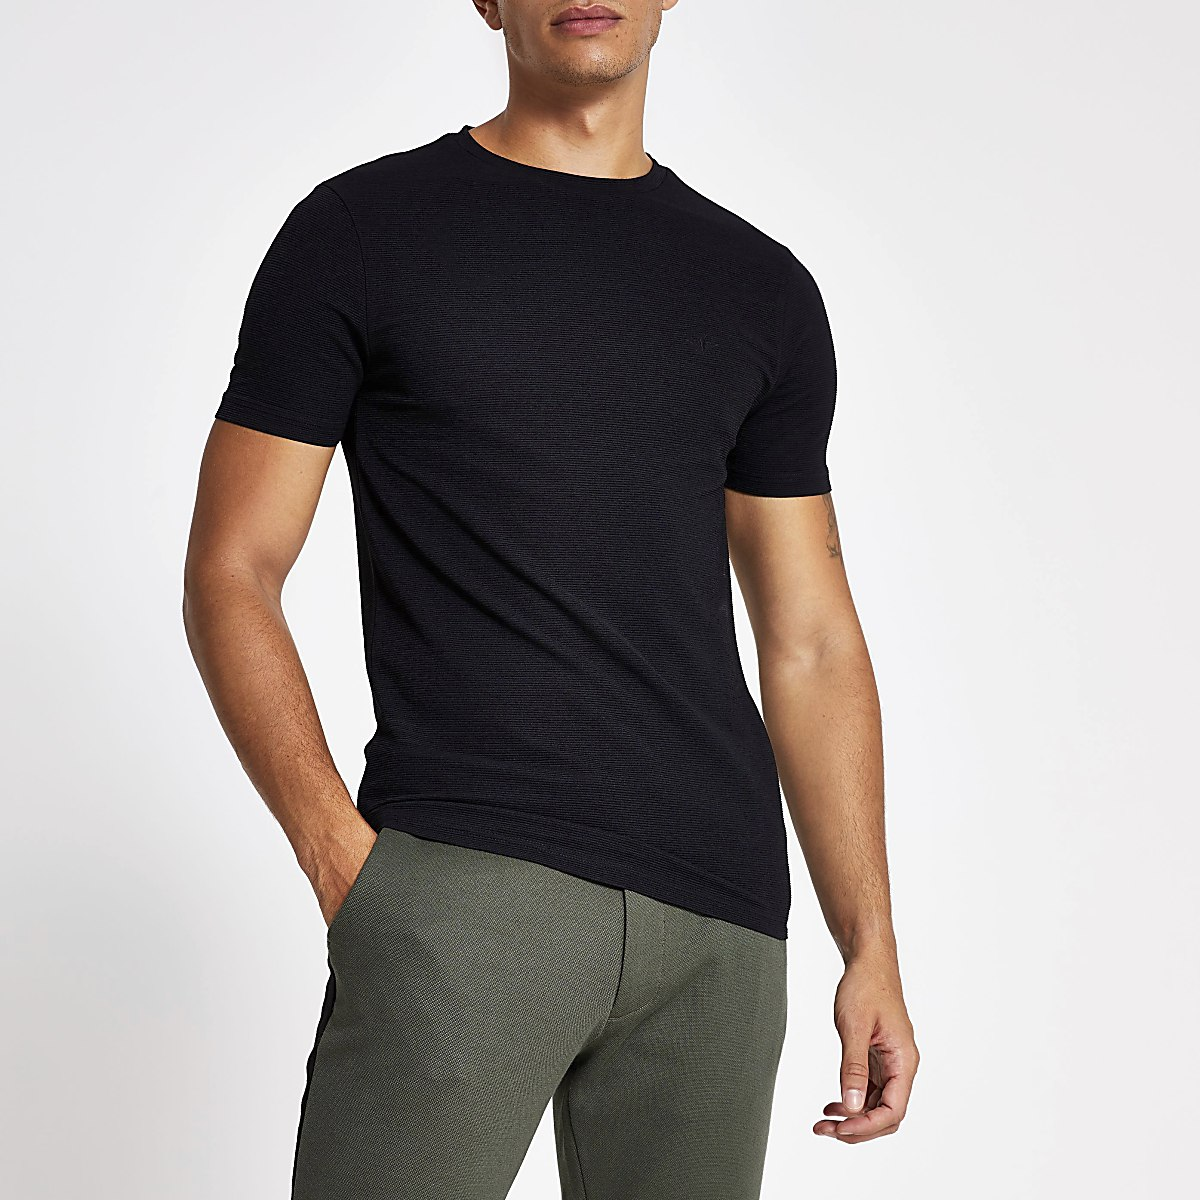 Black ribbed short sleeve T-shirt